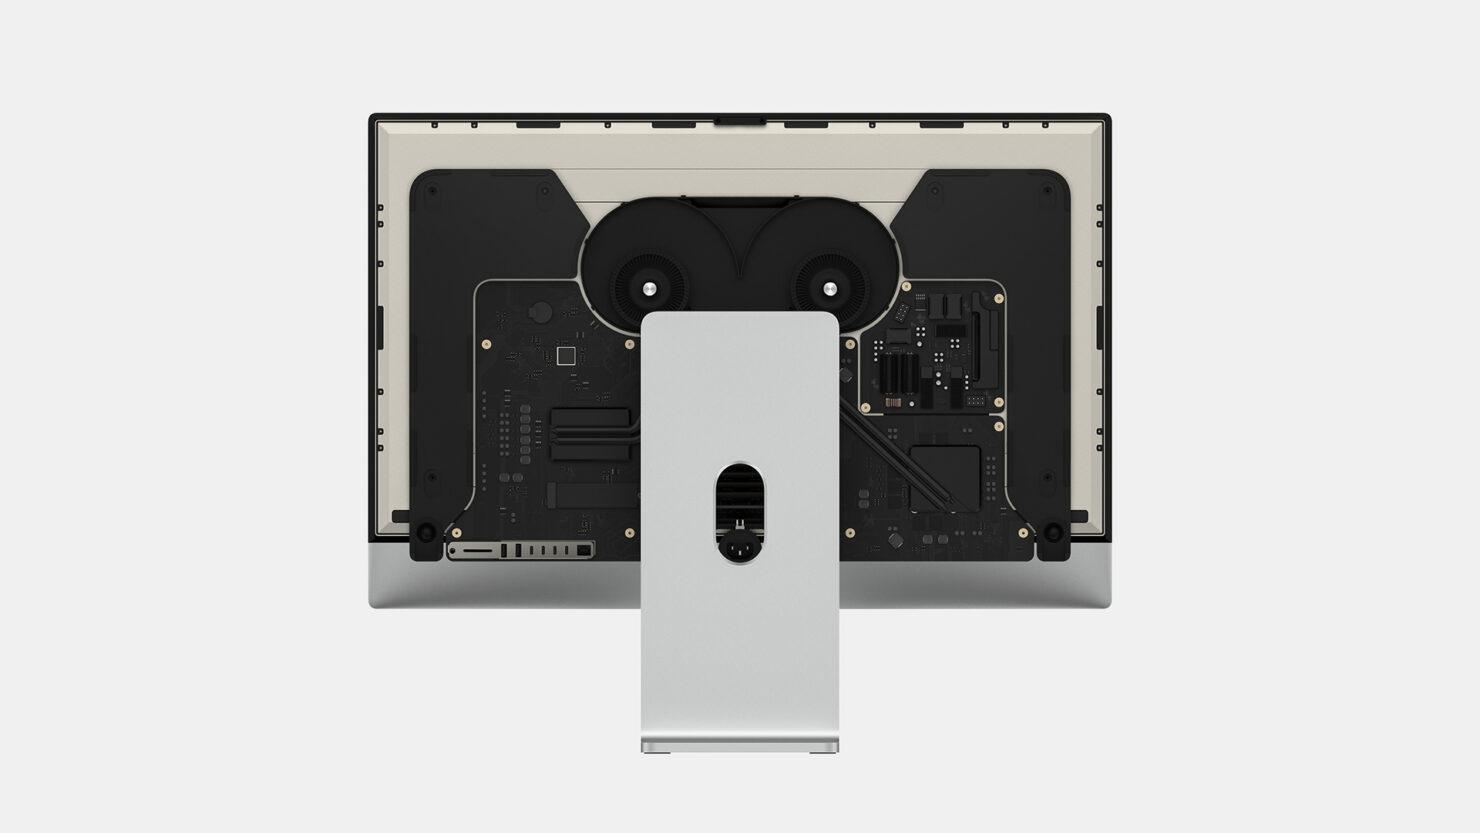 imac-concept-resembling-pro-display-xdr-4